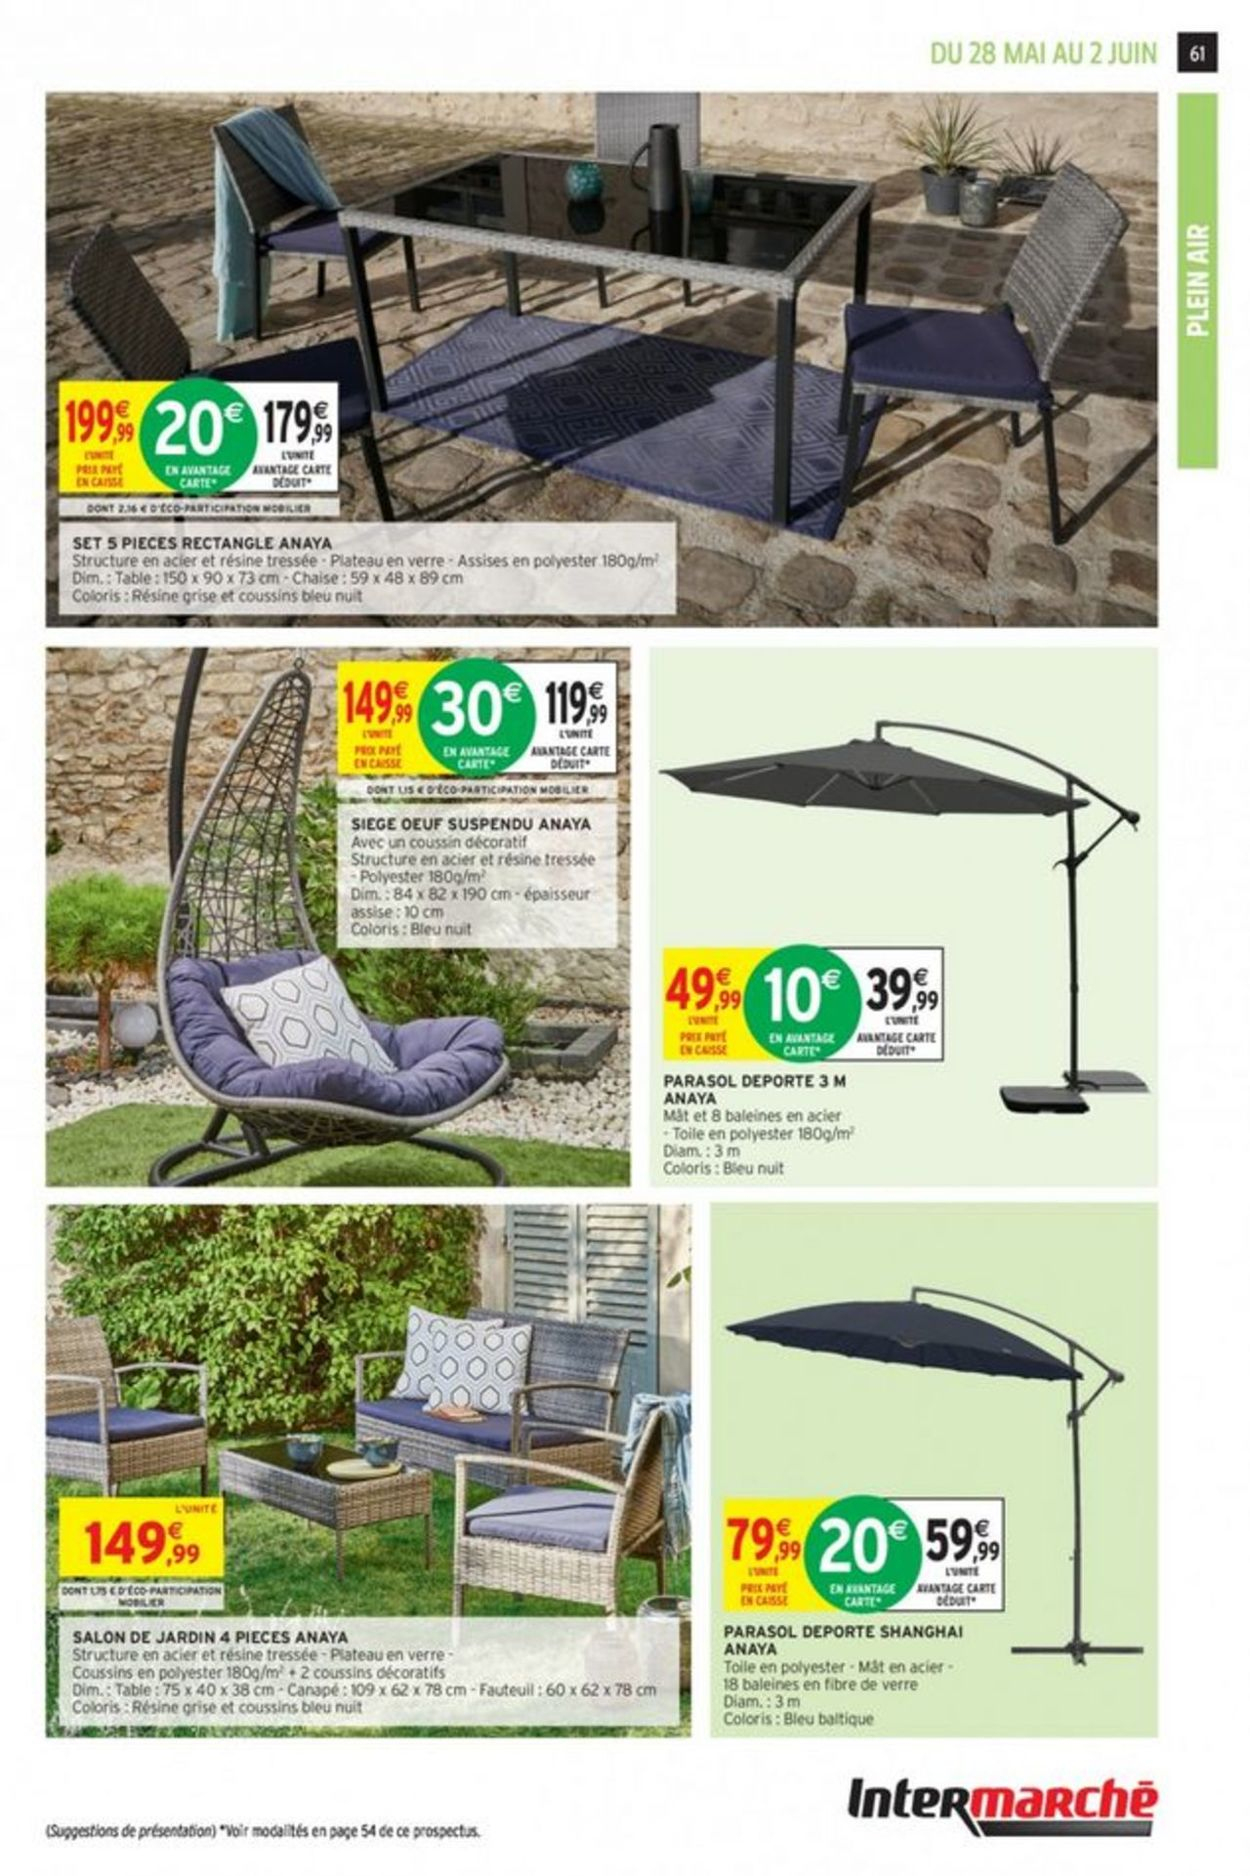 Intermarché Catalogue Actuel 28.05 - 02.06.2019 [59 ... concernant Intermarché Salon De Jardin